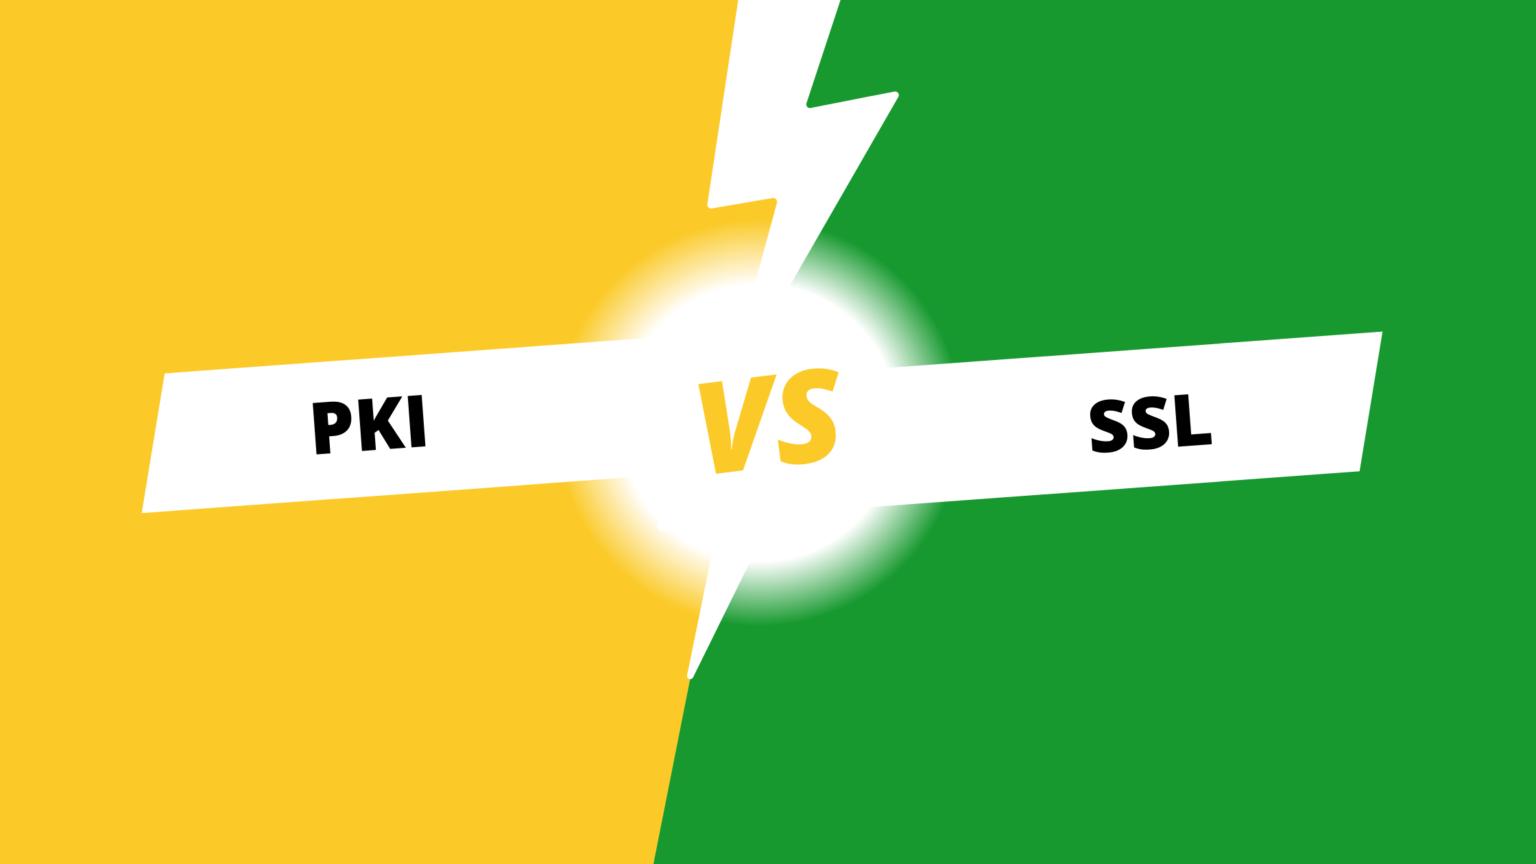 PKI مقابل SSL: ما هي الاختلافات الرئيسية وأوجه التشابه!